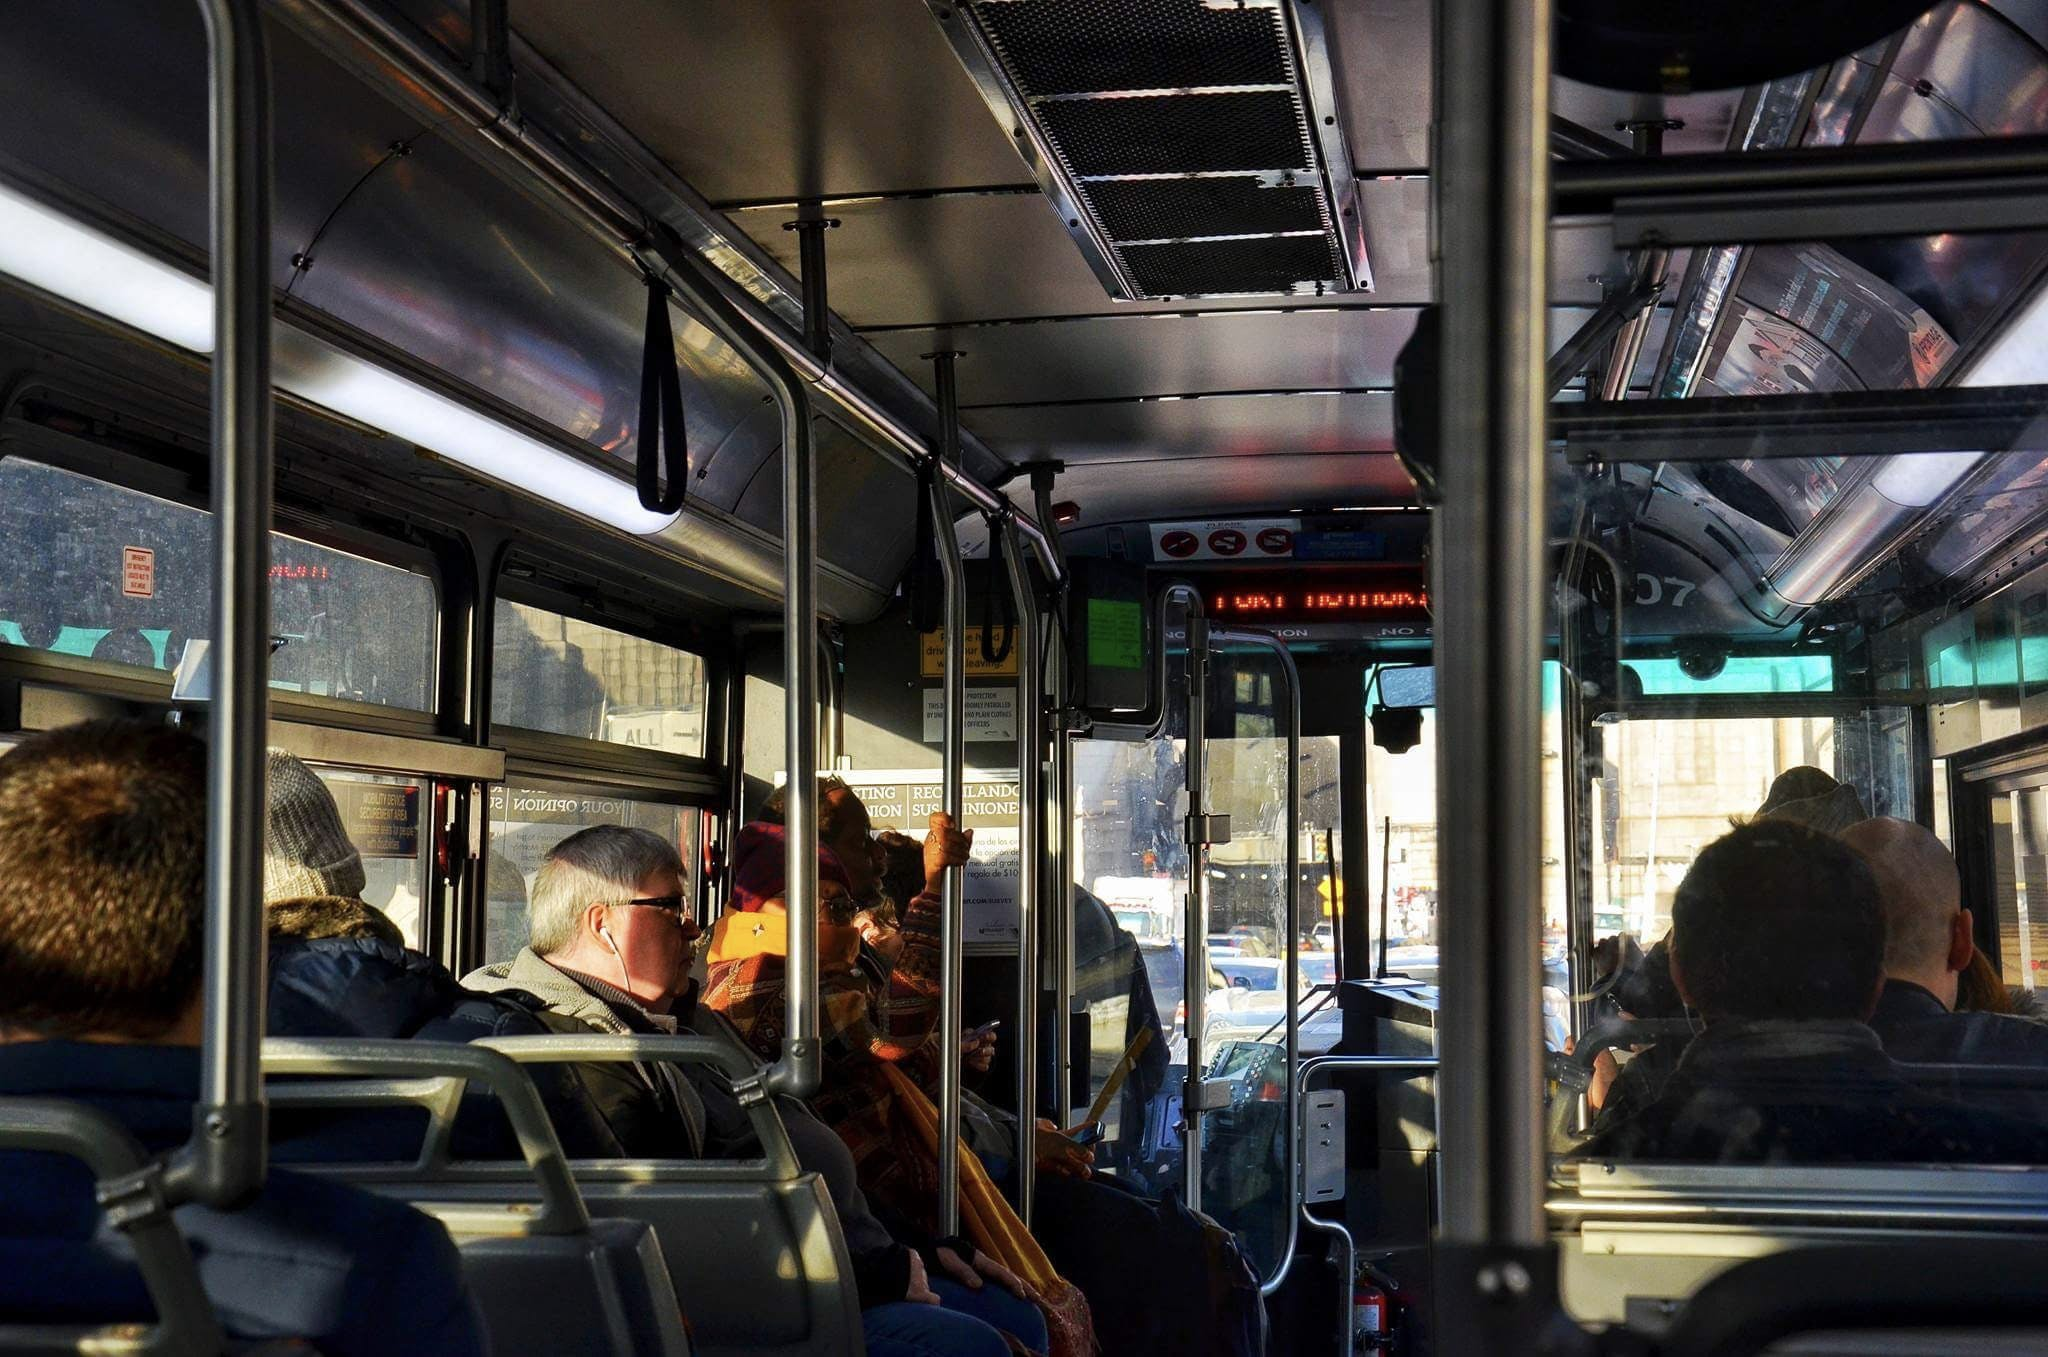 Free stock photo of new york city, people, public transport, sunlight